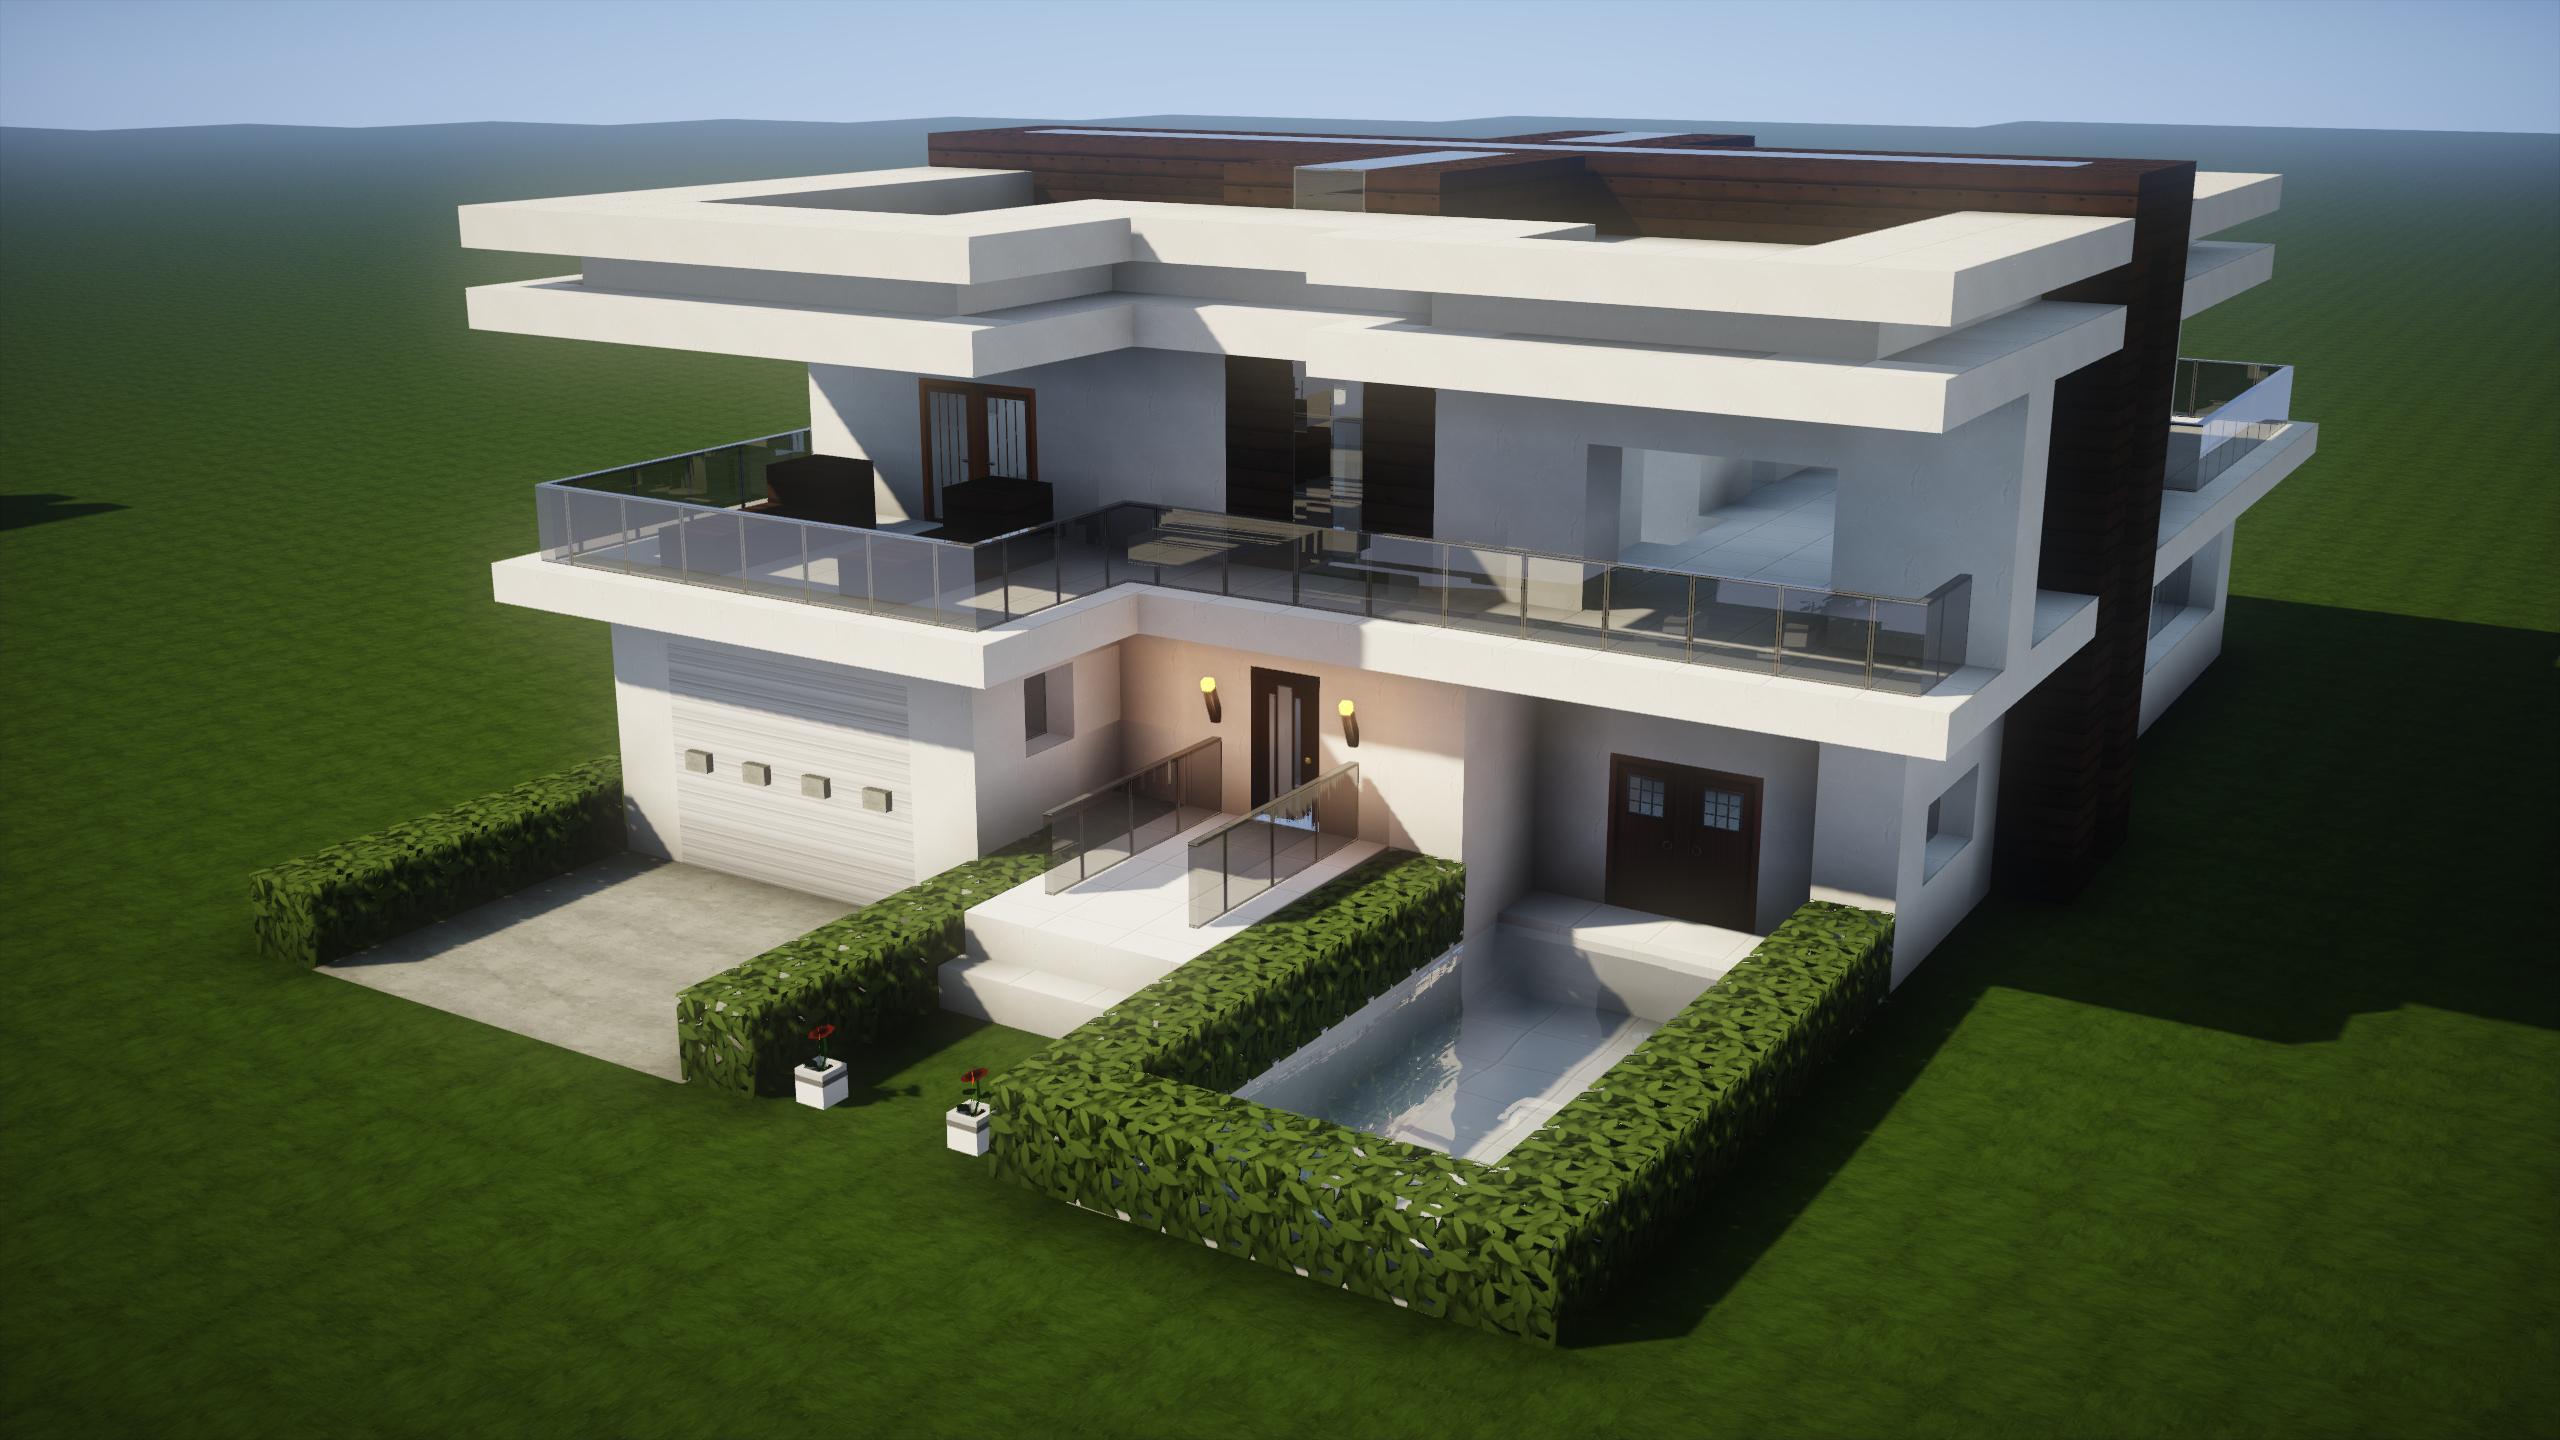 Maison moderne avec garage et piscine à minecraft